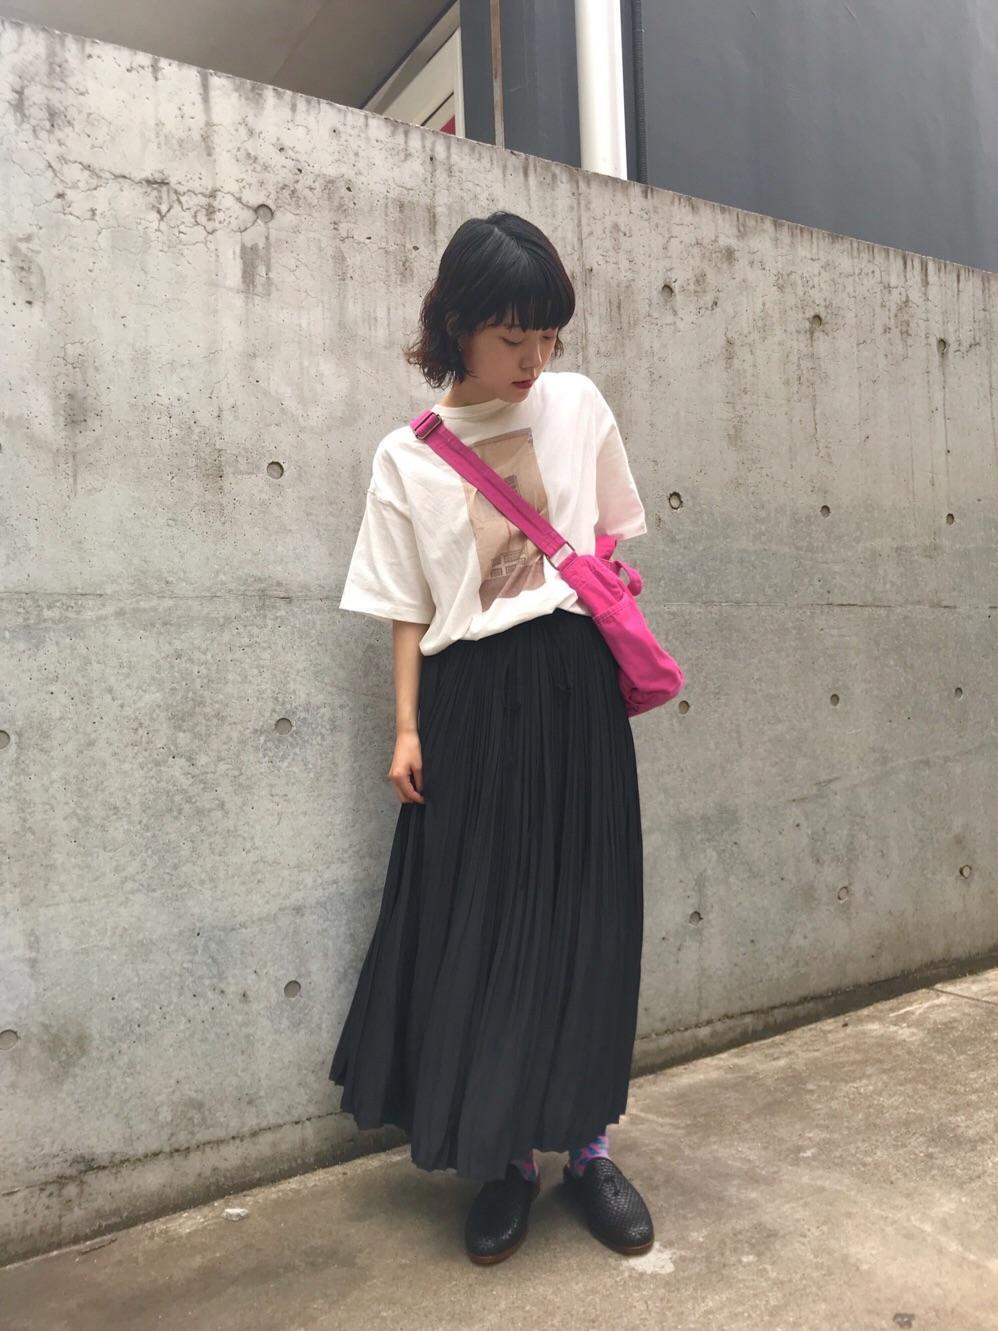 bulle de savon 中目黒路面 身長:153cm 2019.06.18